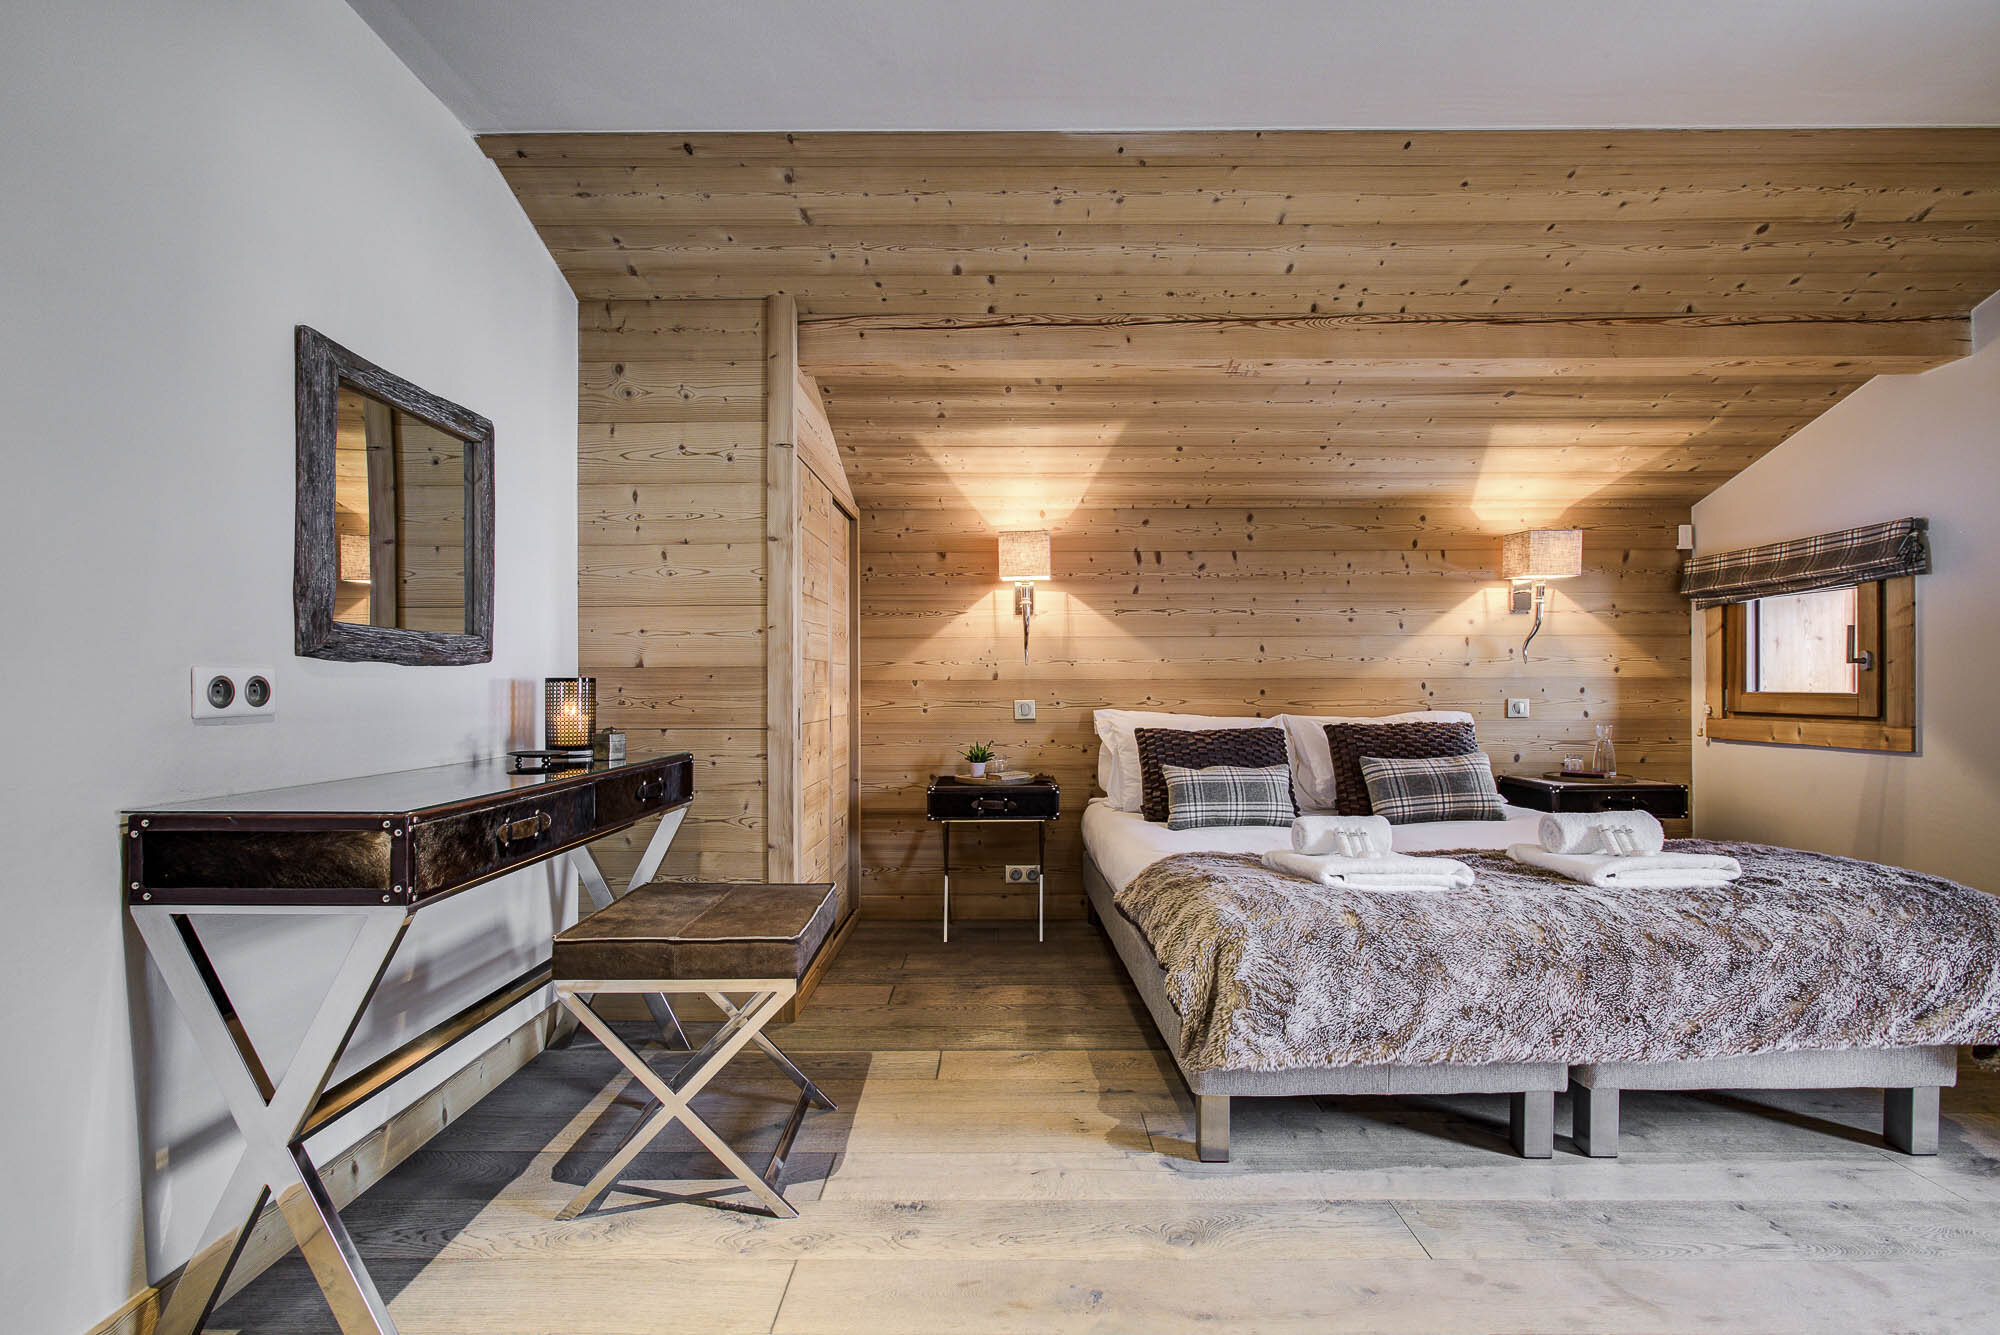 tg-ski-luxury-chalet-les-pierrys-morzine-007.jpg